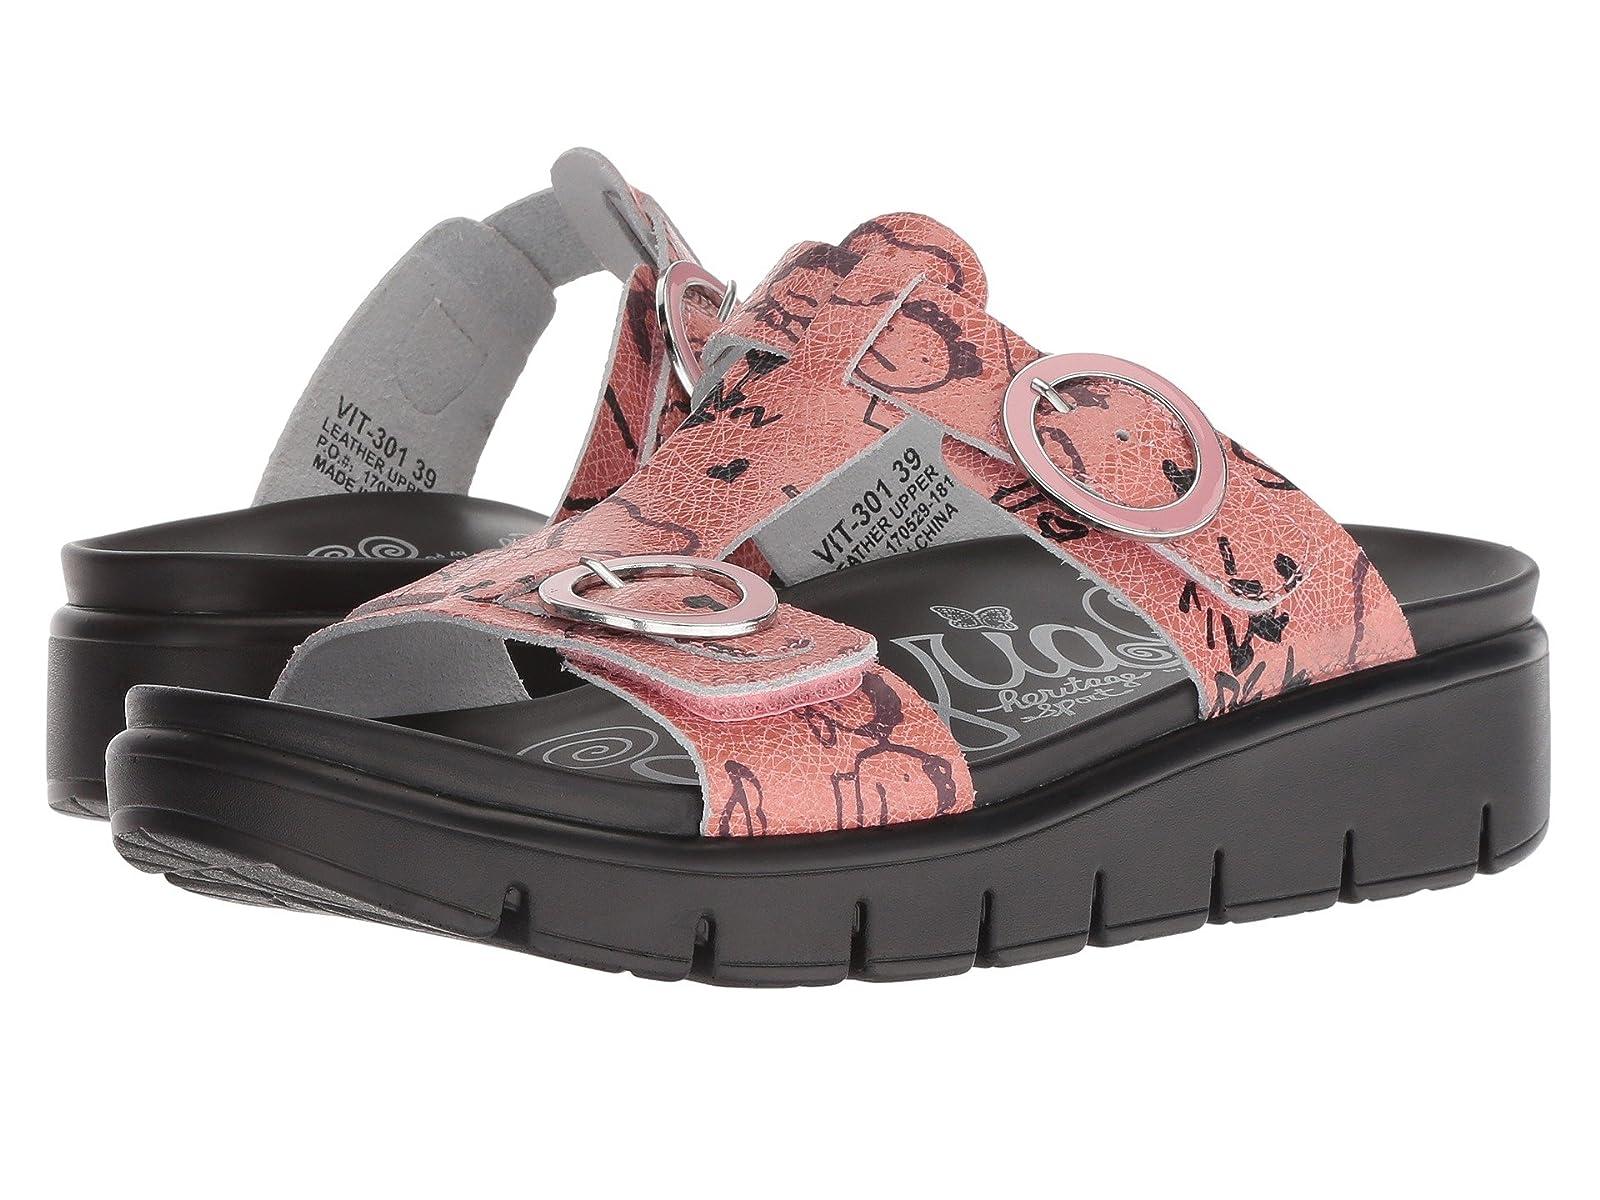 Alegria VitaCheap and distinctive eye-catching shoes